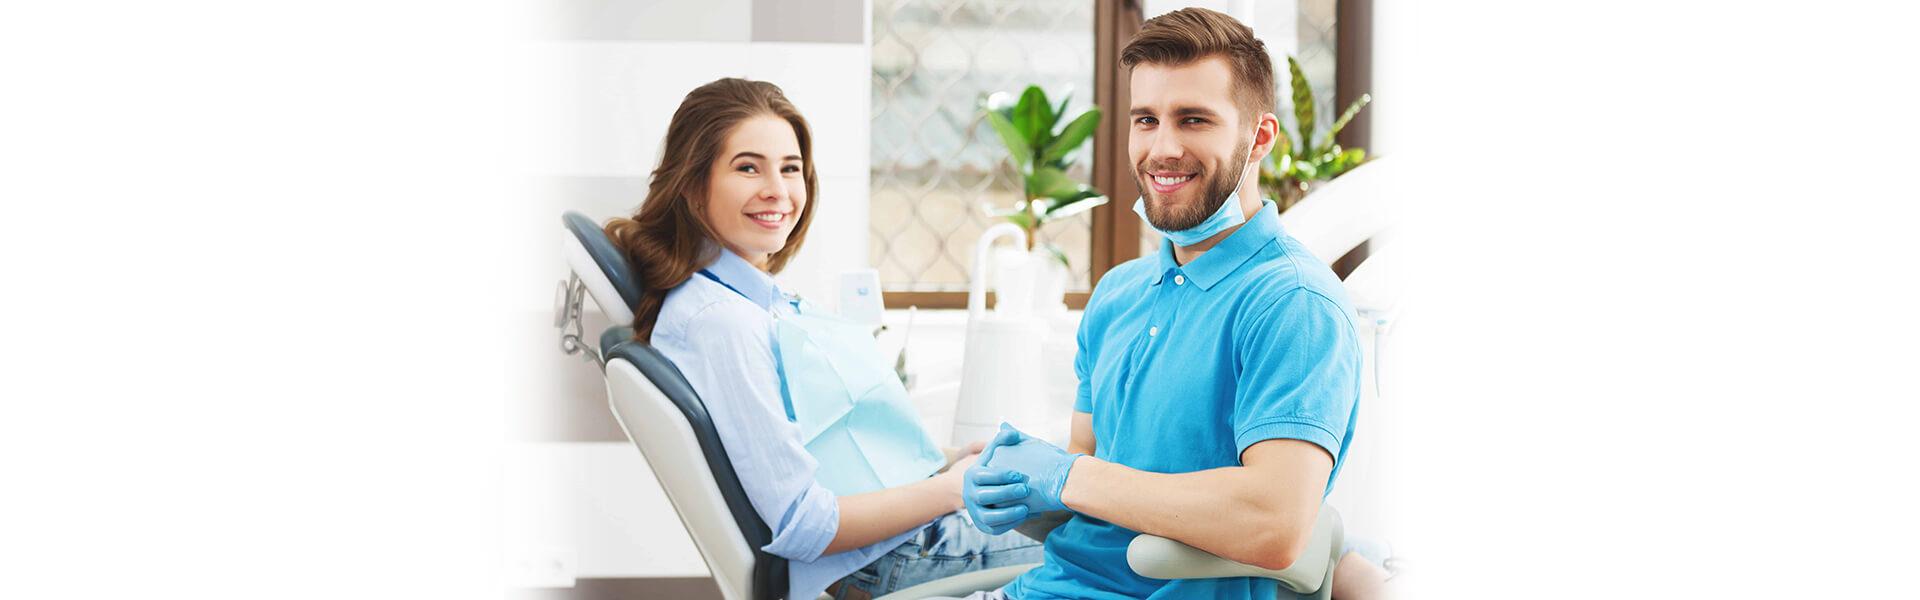 General Dentistry in Westwood, MA